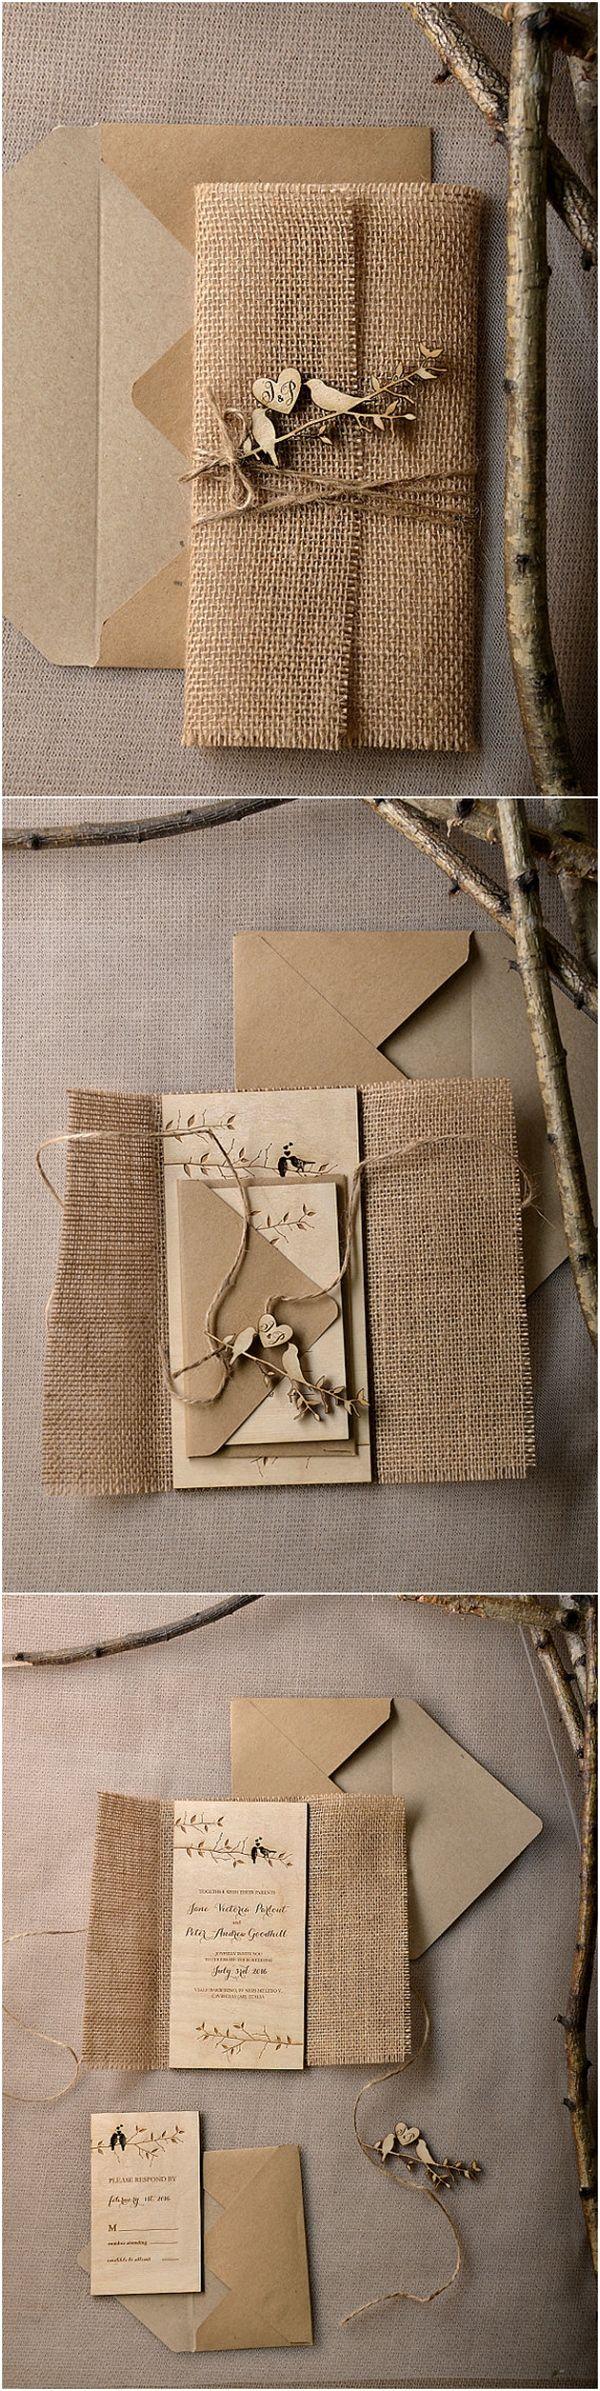 country wedding invitations Eco Burlap Rustic Country Laser cut Wood Wedding Invitation Suite